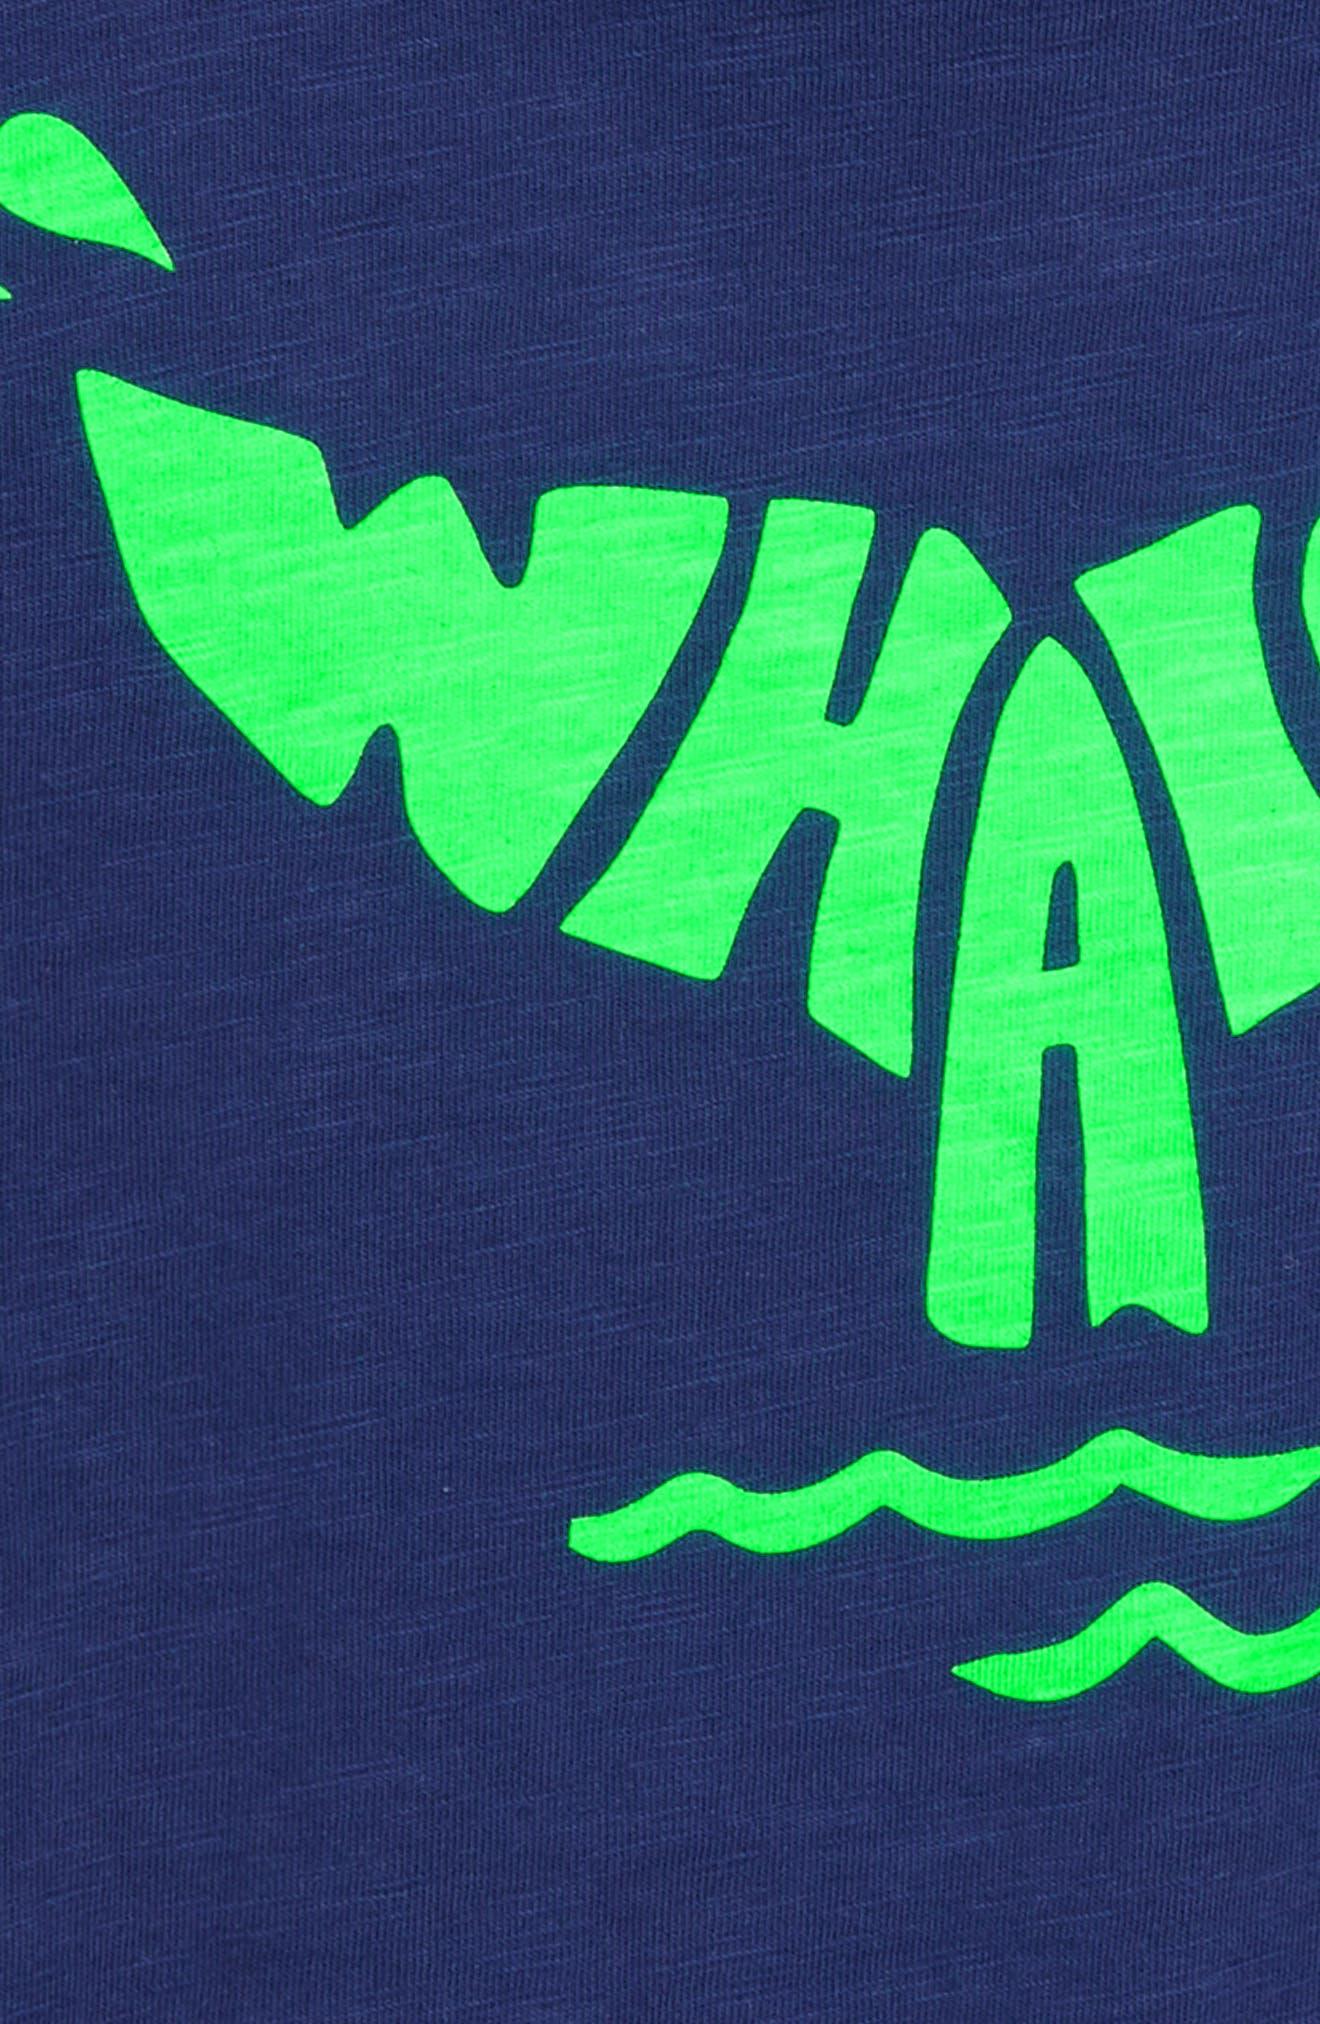 Fluoro Whale T-Shirt,                             Alternate thumbnail 2, color,                             Beacon Blue Whale